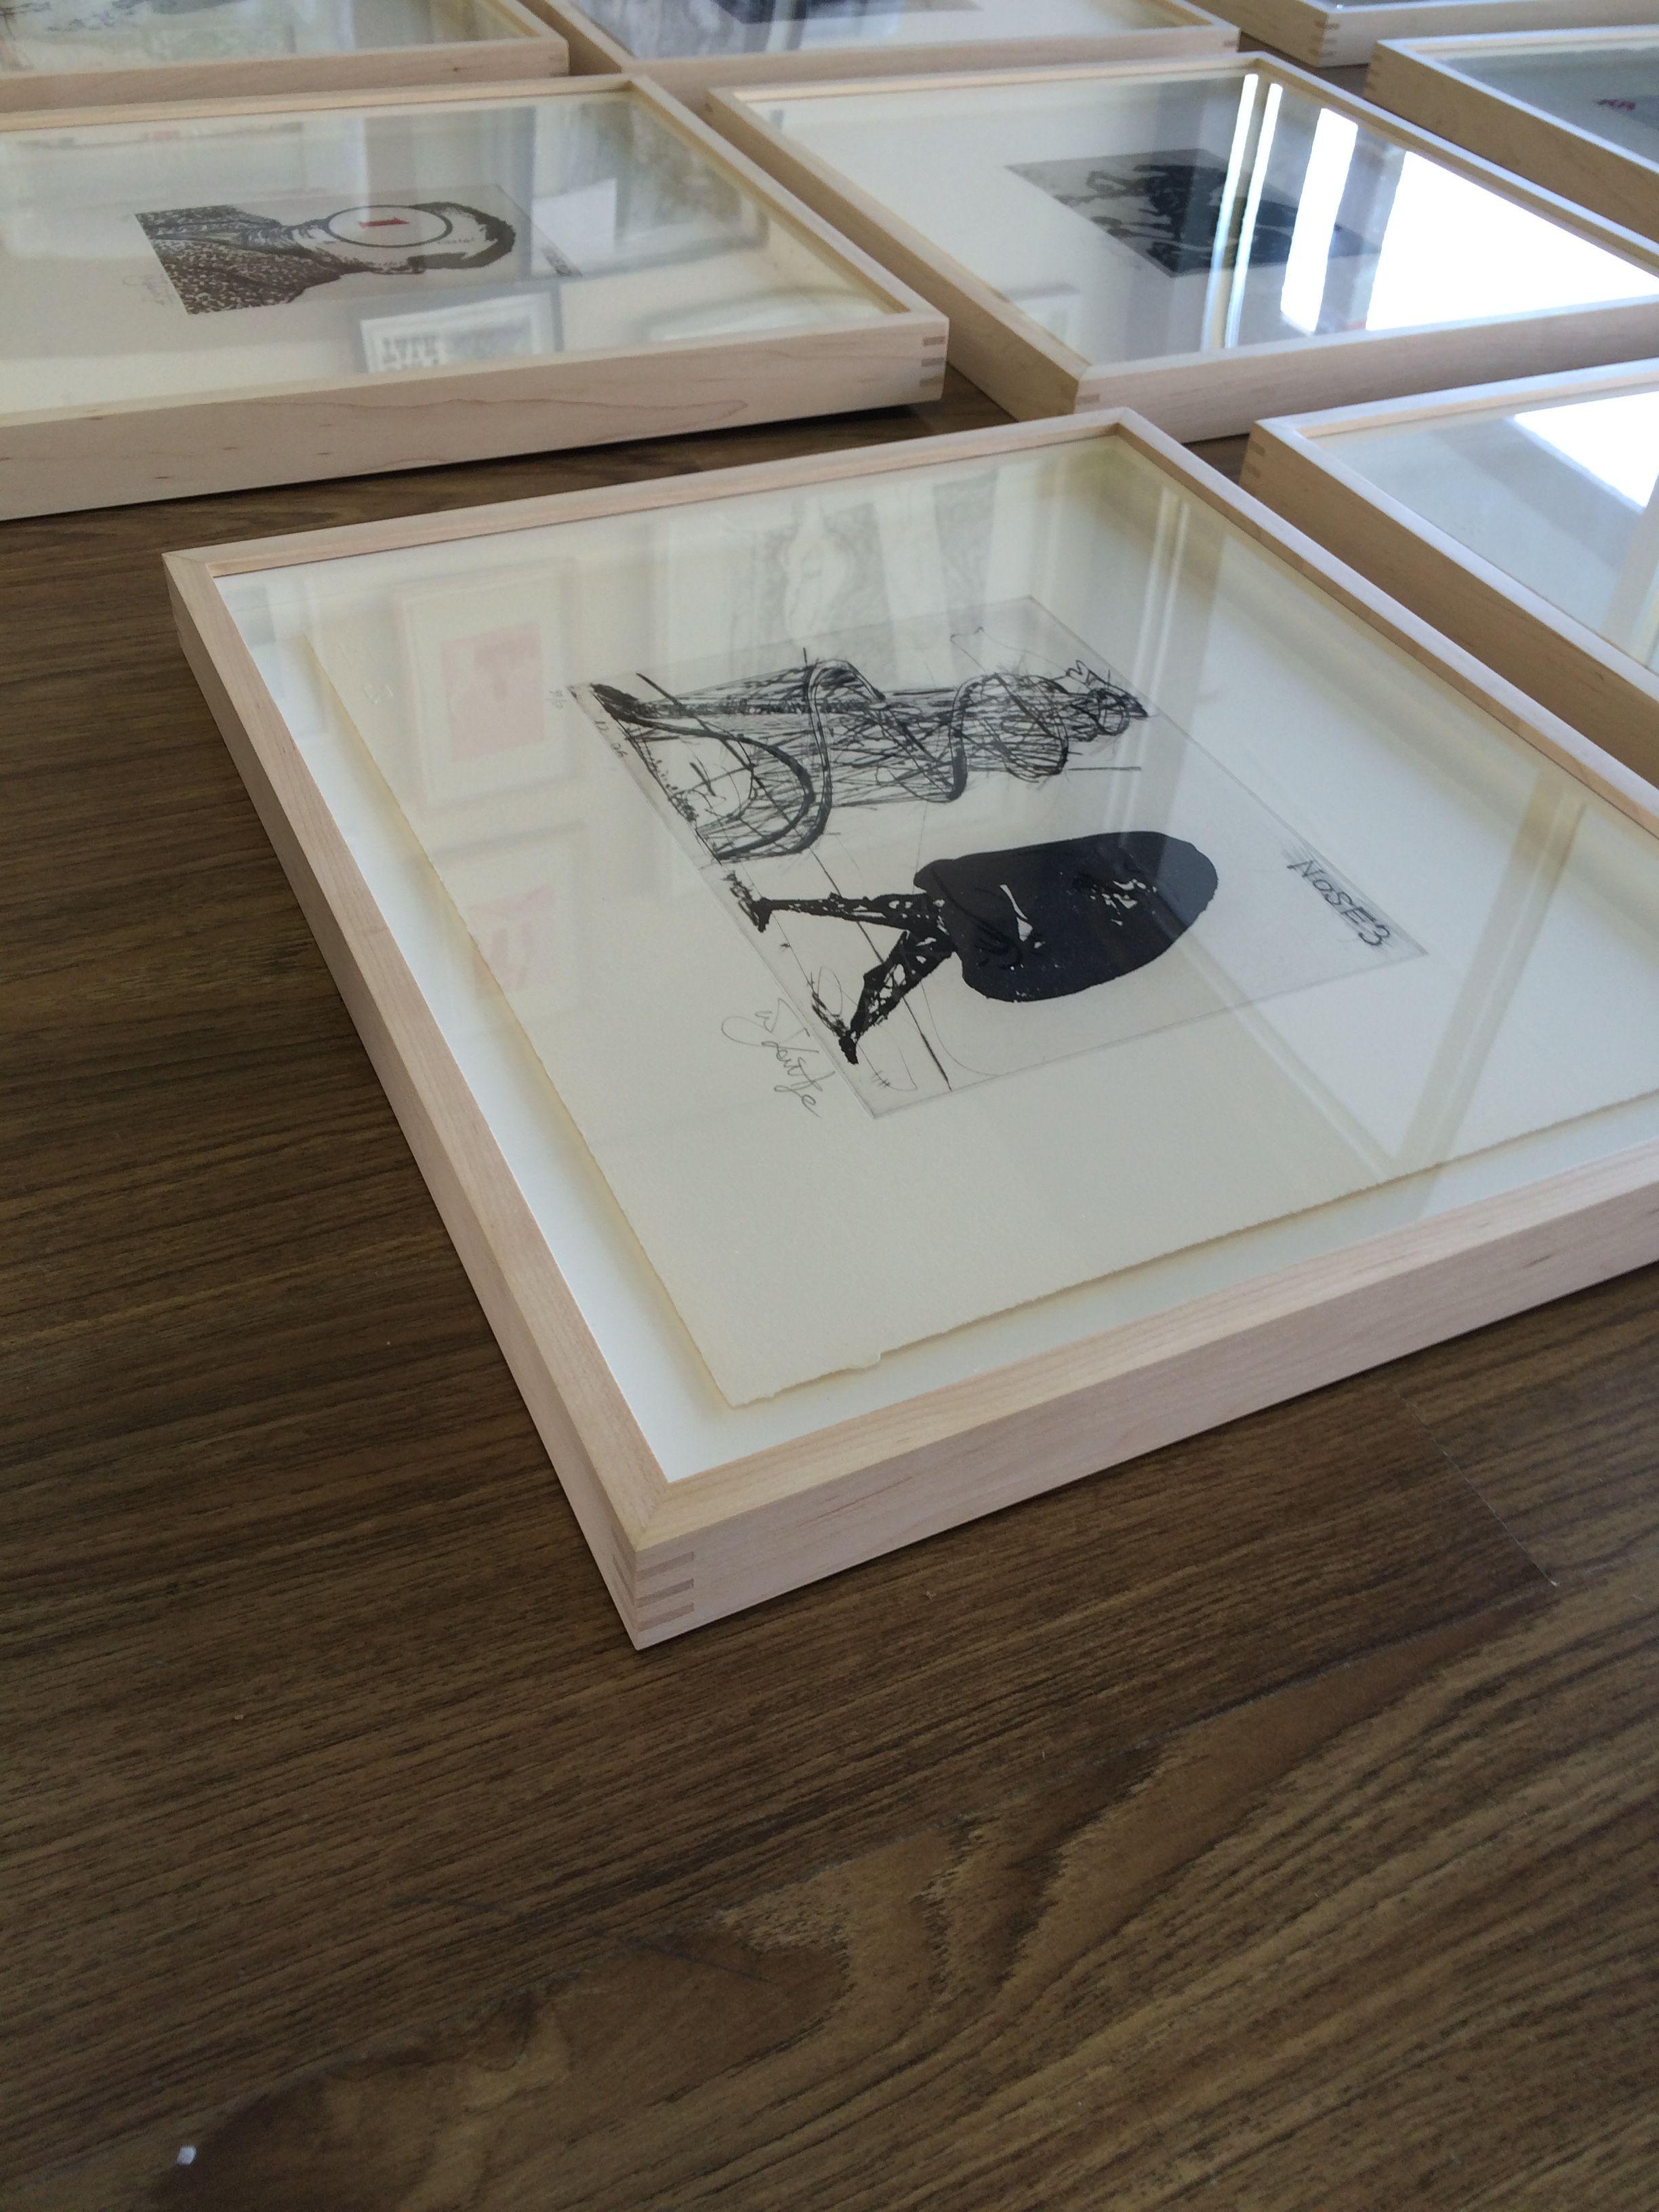 William kentridge prints by nb art and framing float mount in william kentridge prints by nb art and framing float mount in maple hardwood with splines jeuxipadfo Gallery